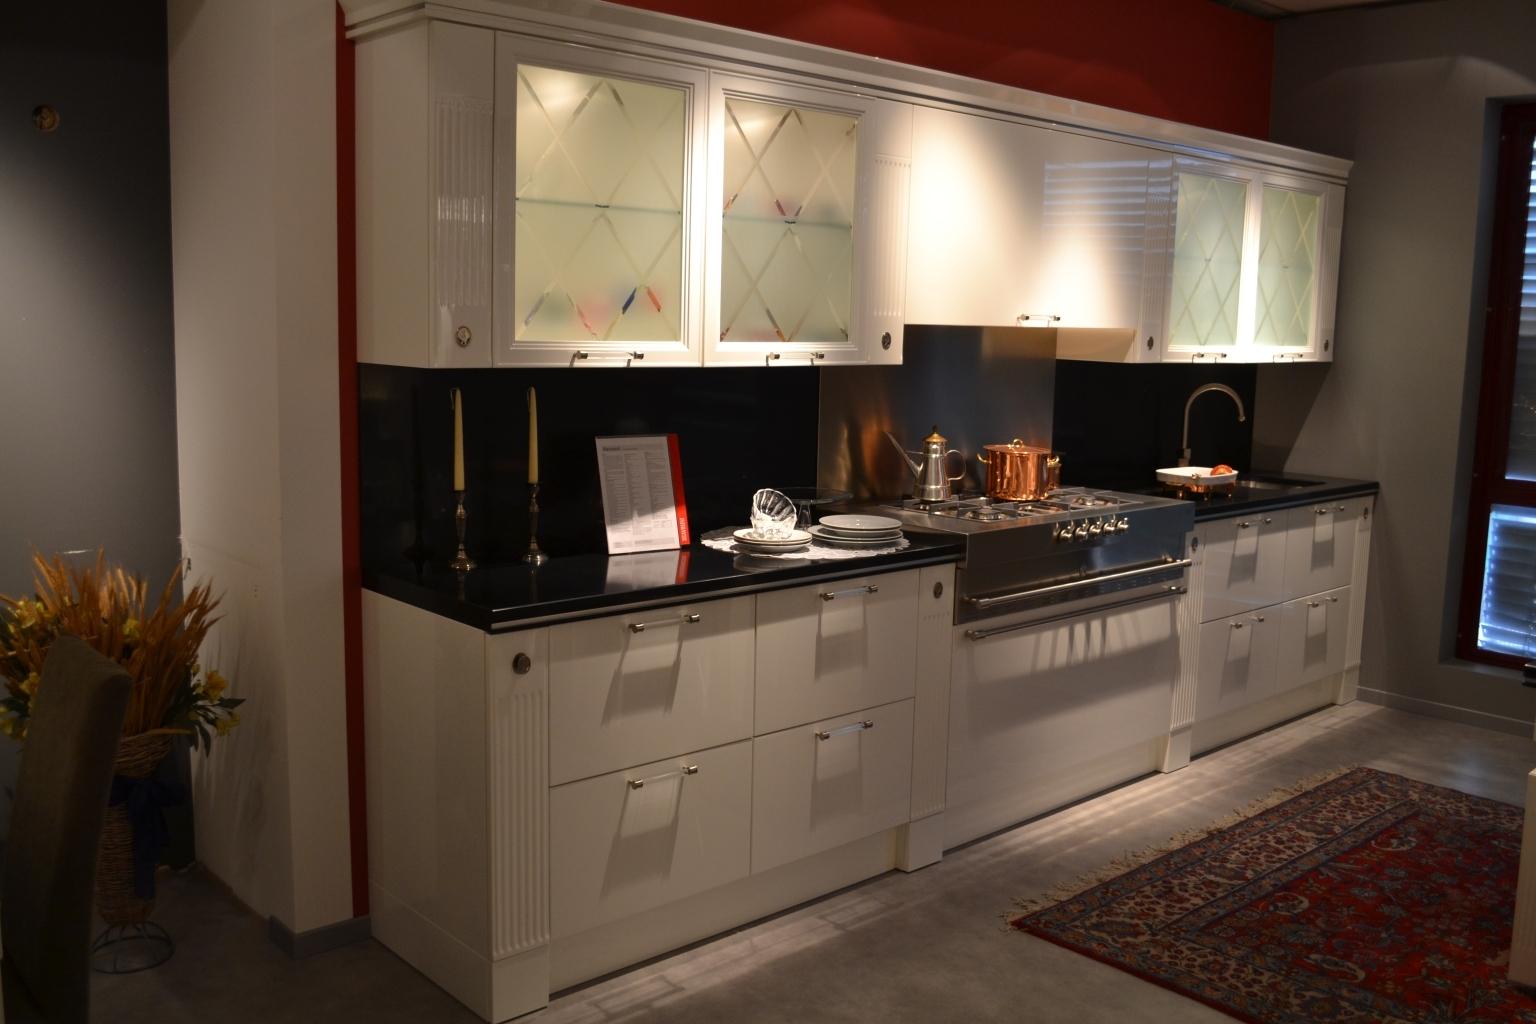 Baccarat scavolini offerta cucine a prezzi scontati for Outlet arredamento cucine